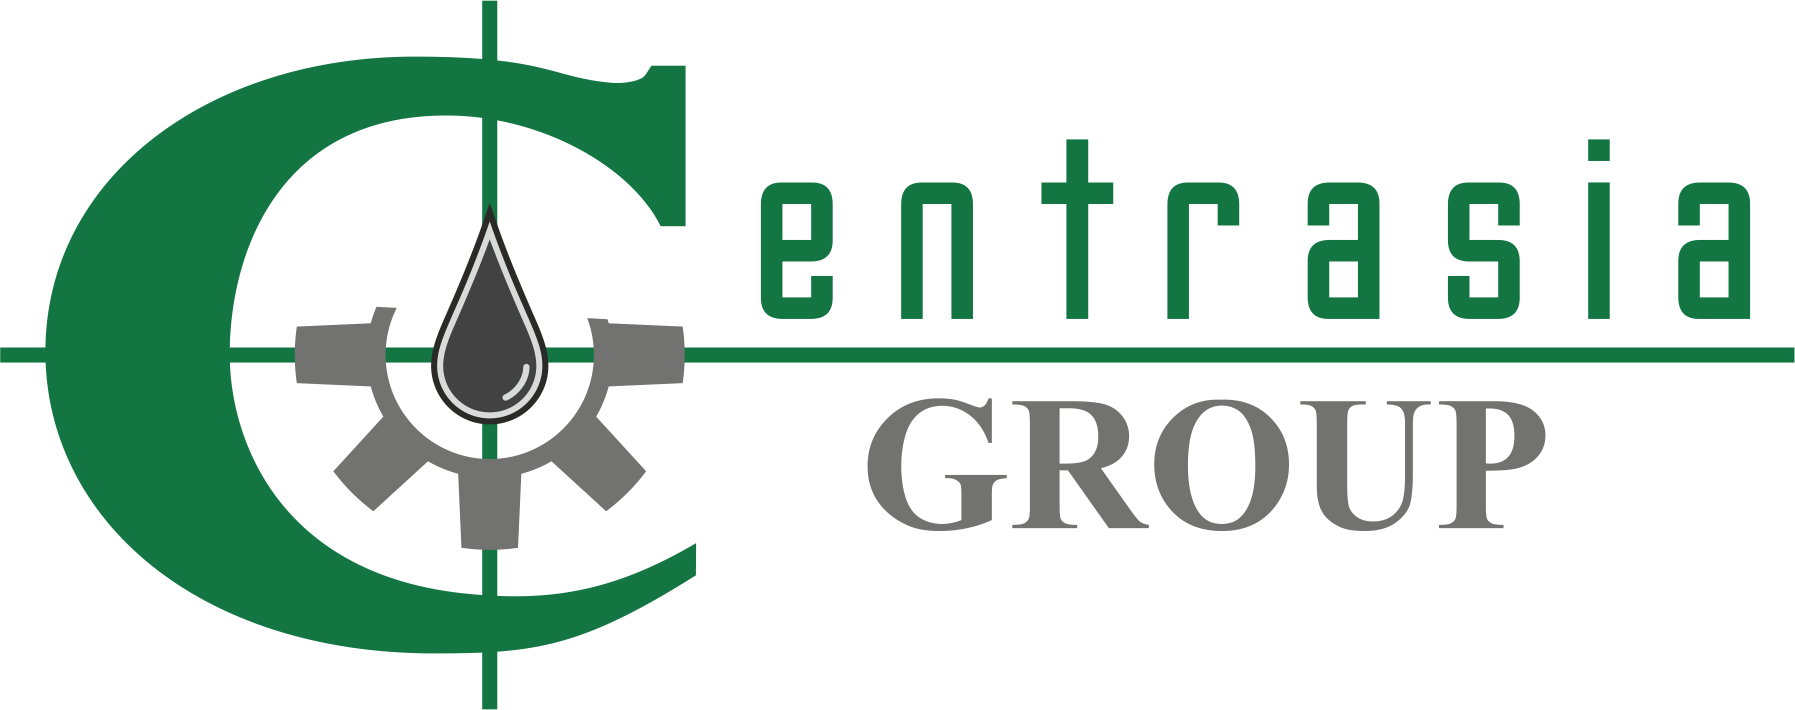 Centrasia Group